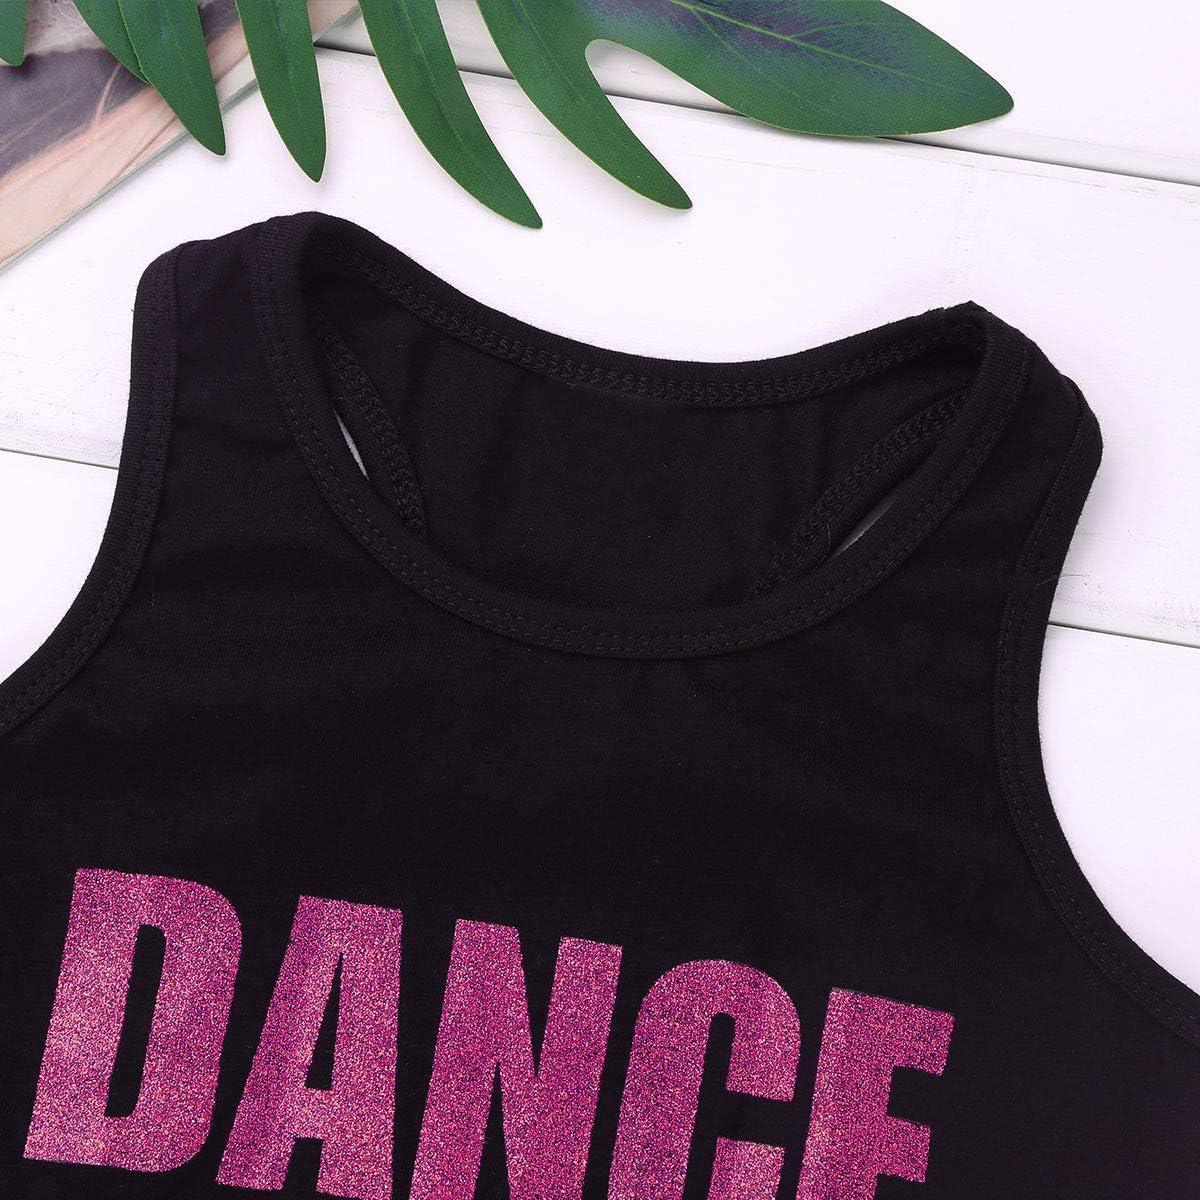 ranrann Kids Girls Sleeveless Racer Back Shiny Letters Dance Printed Crop Top Sports Bra for Ballet Dance Athletics Sport Workout